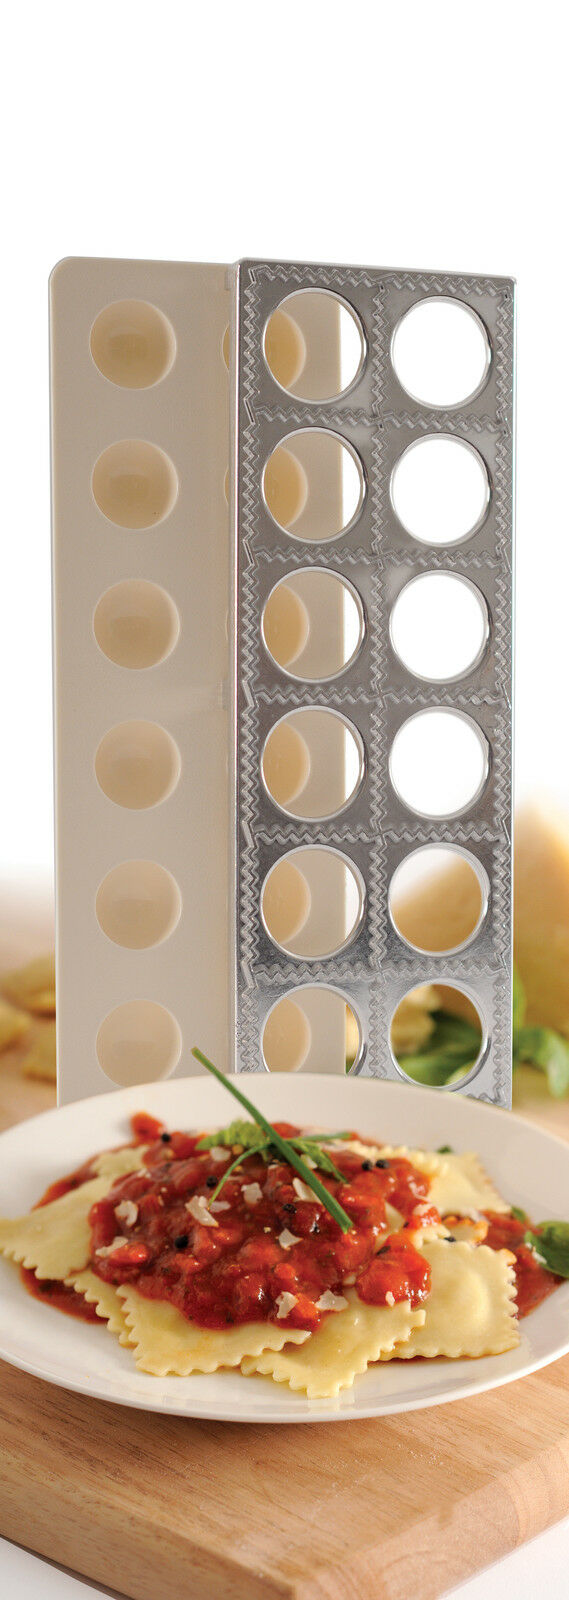 Norpro 1043 Ravioli Maker With Press Pasta Dough Mold Tool on sale